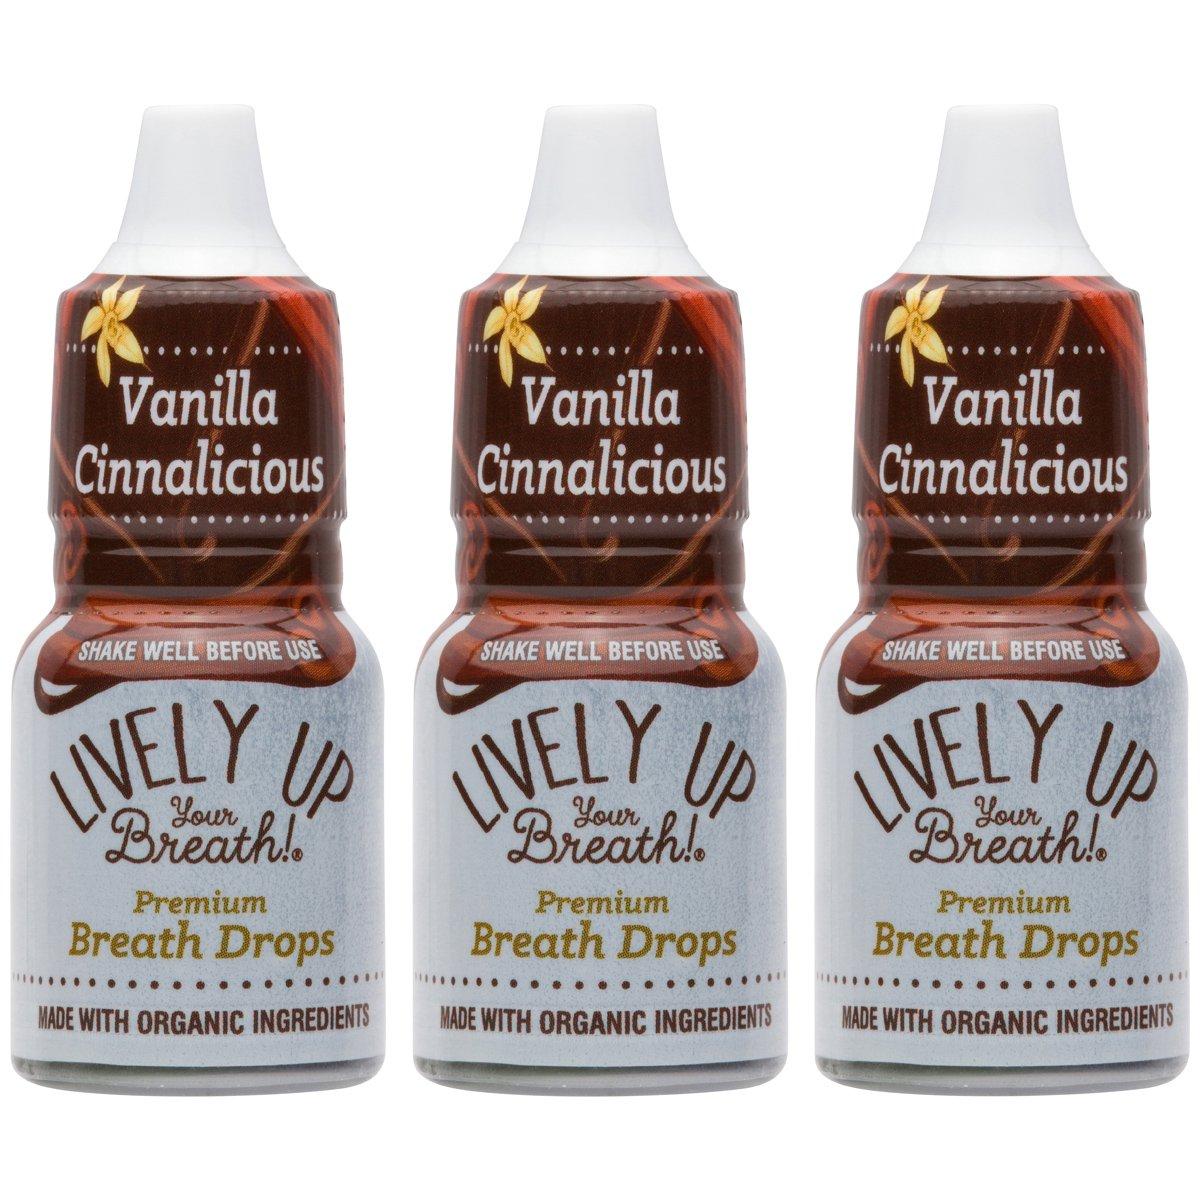 Lively Up Your Breath Premium Breath Freshener Liquid Drops with Organic Ingredients - Vanilla Cinnalicious 3 Pack